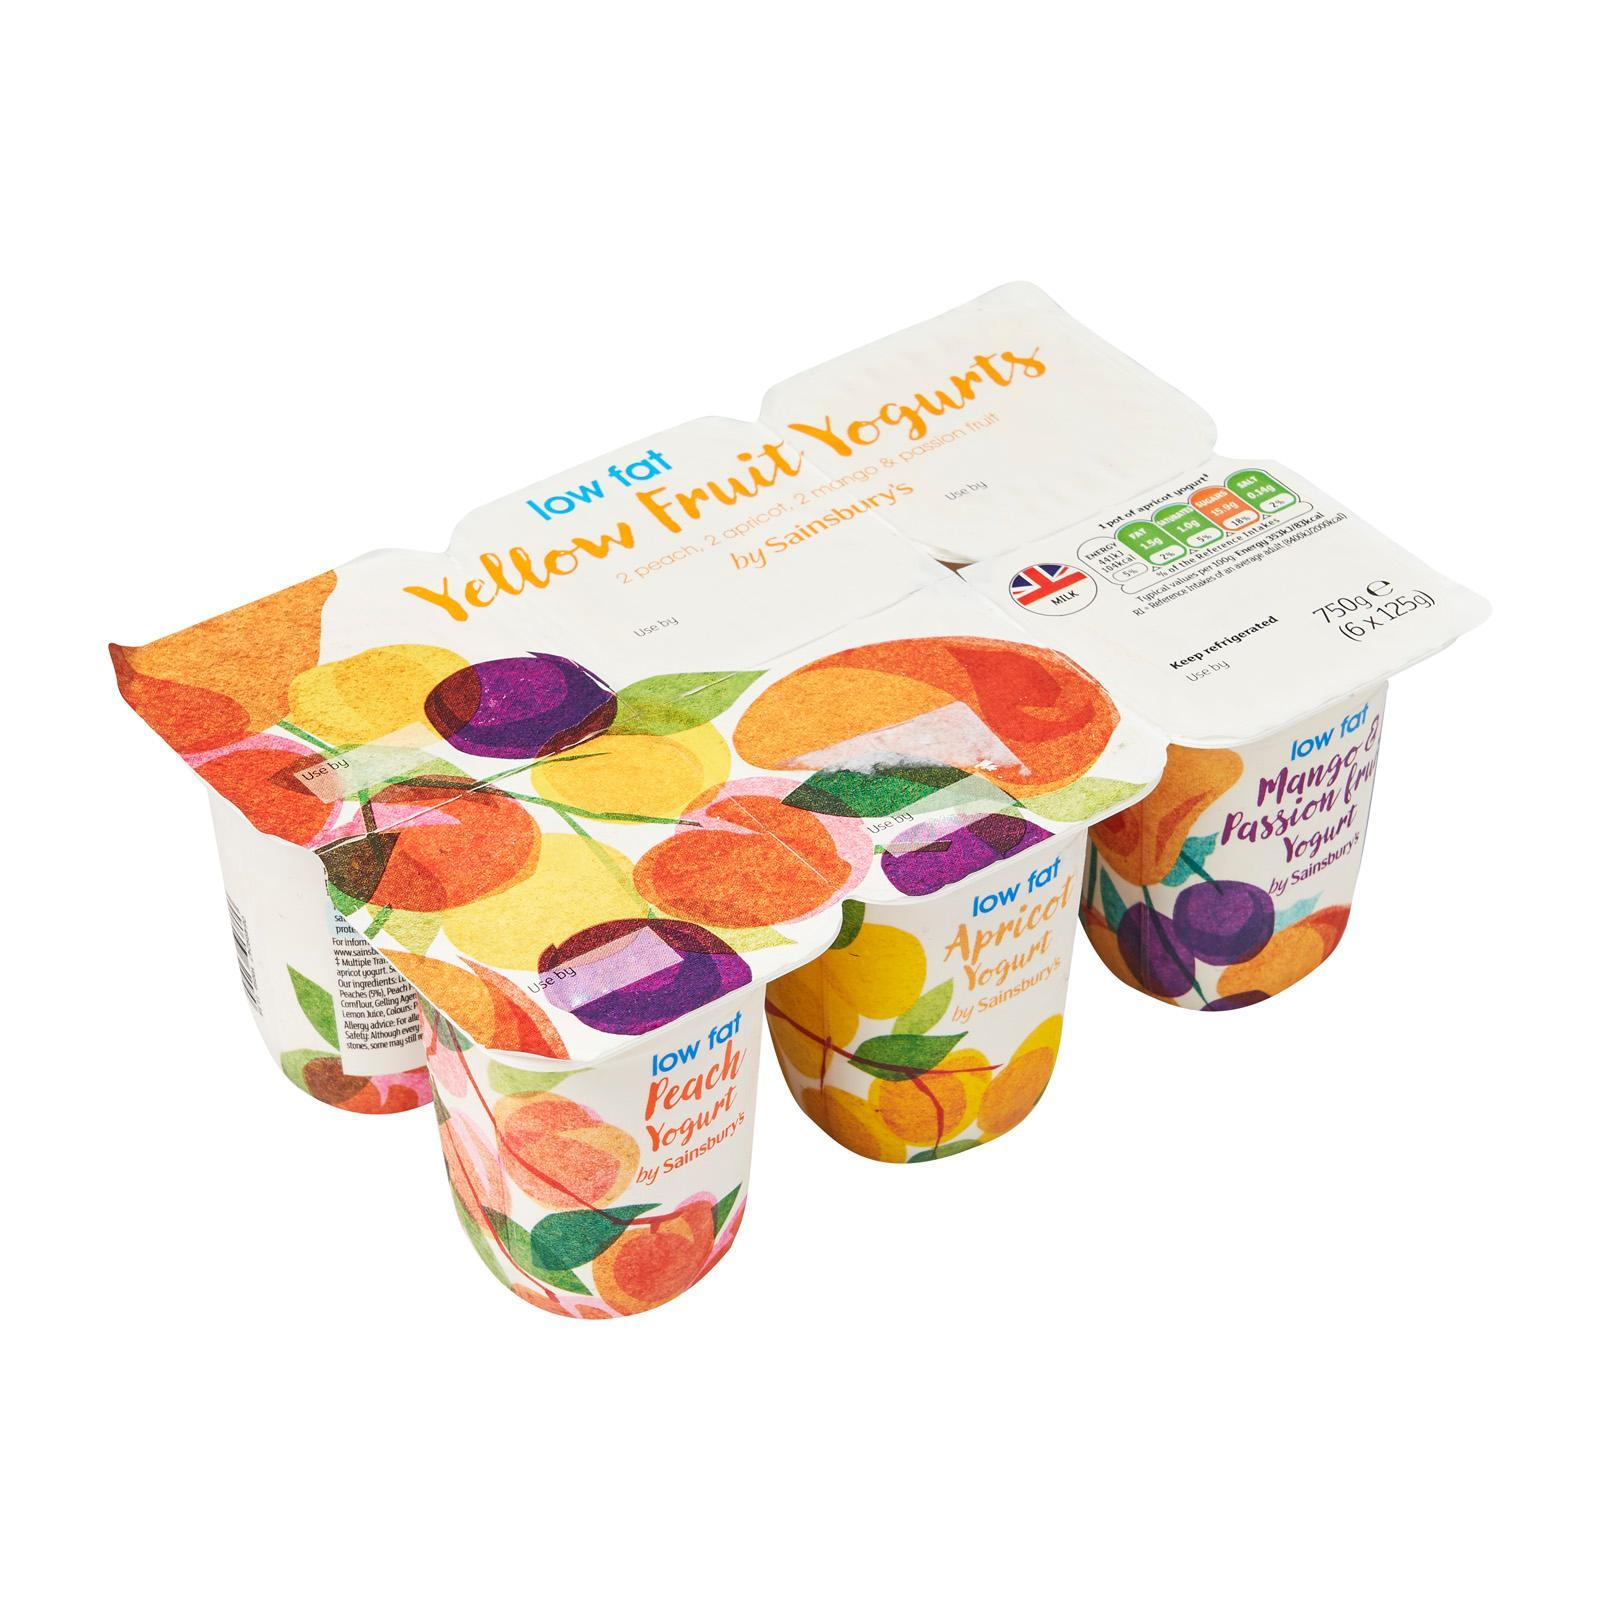 Sainsbury's Low Fat Yellow Fruits Yoghurt 6S